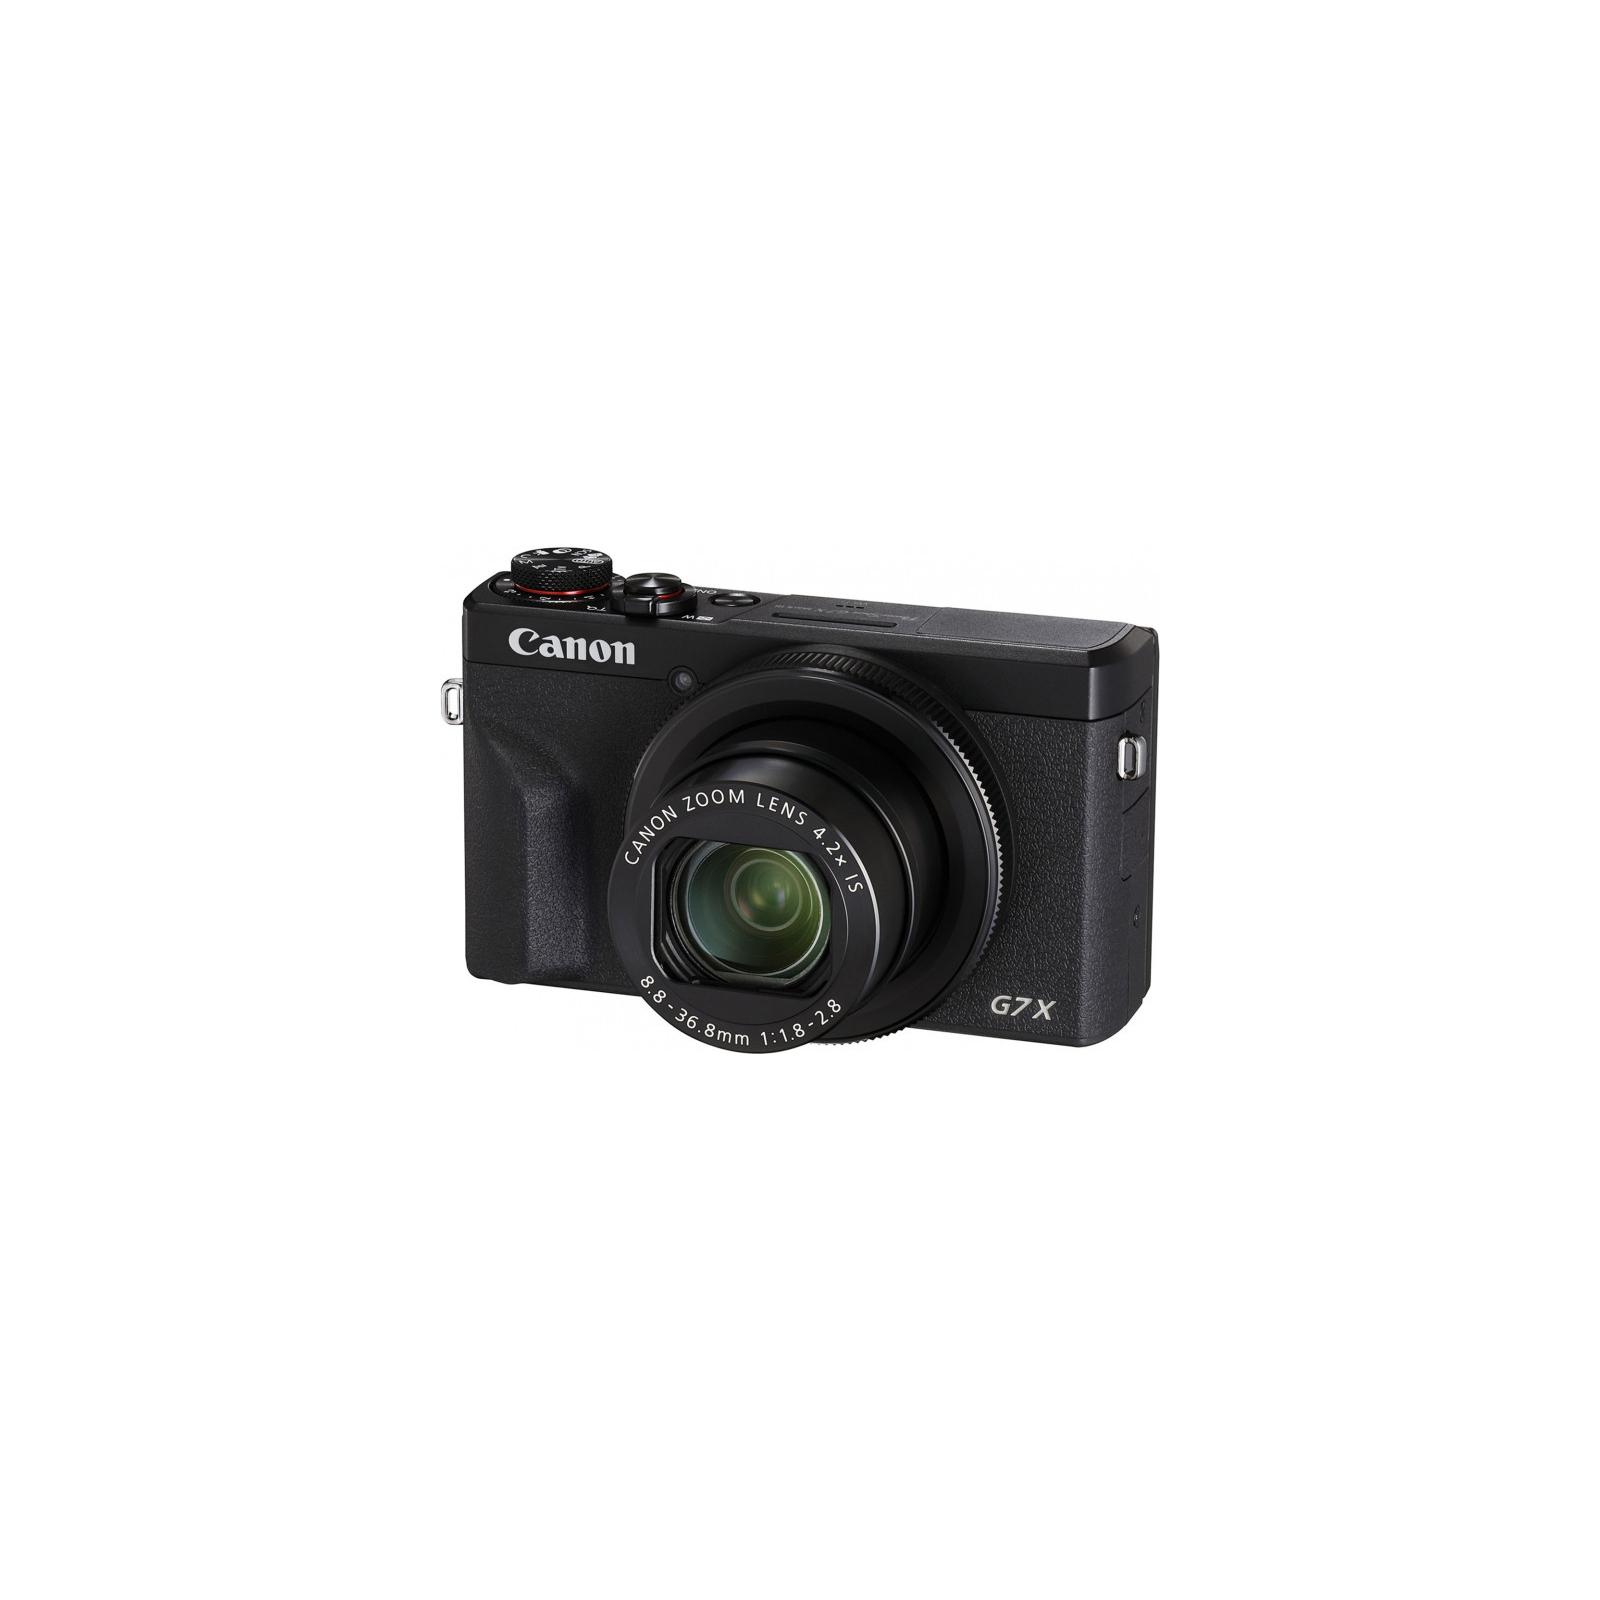 Цифровой фотоаппарат Canon Powershot G7 X Mark III Black (3637C013) изображение 3